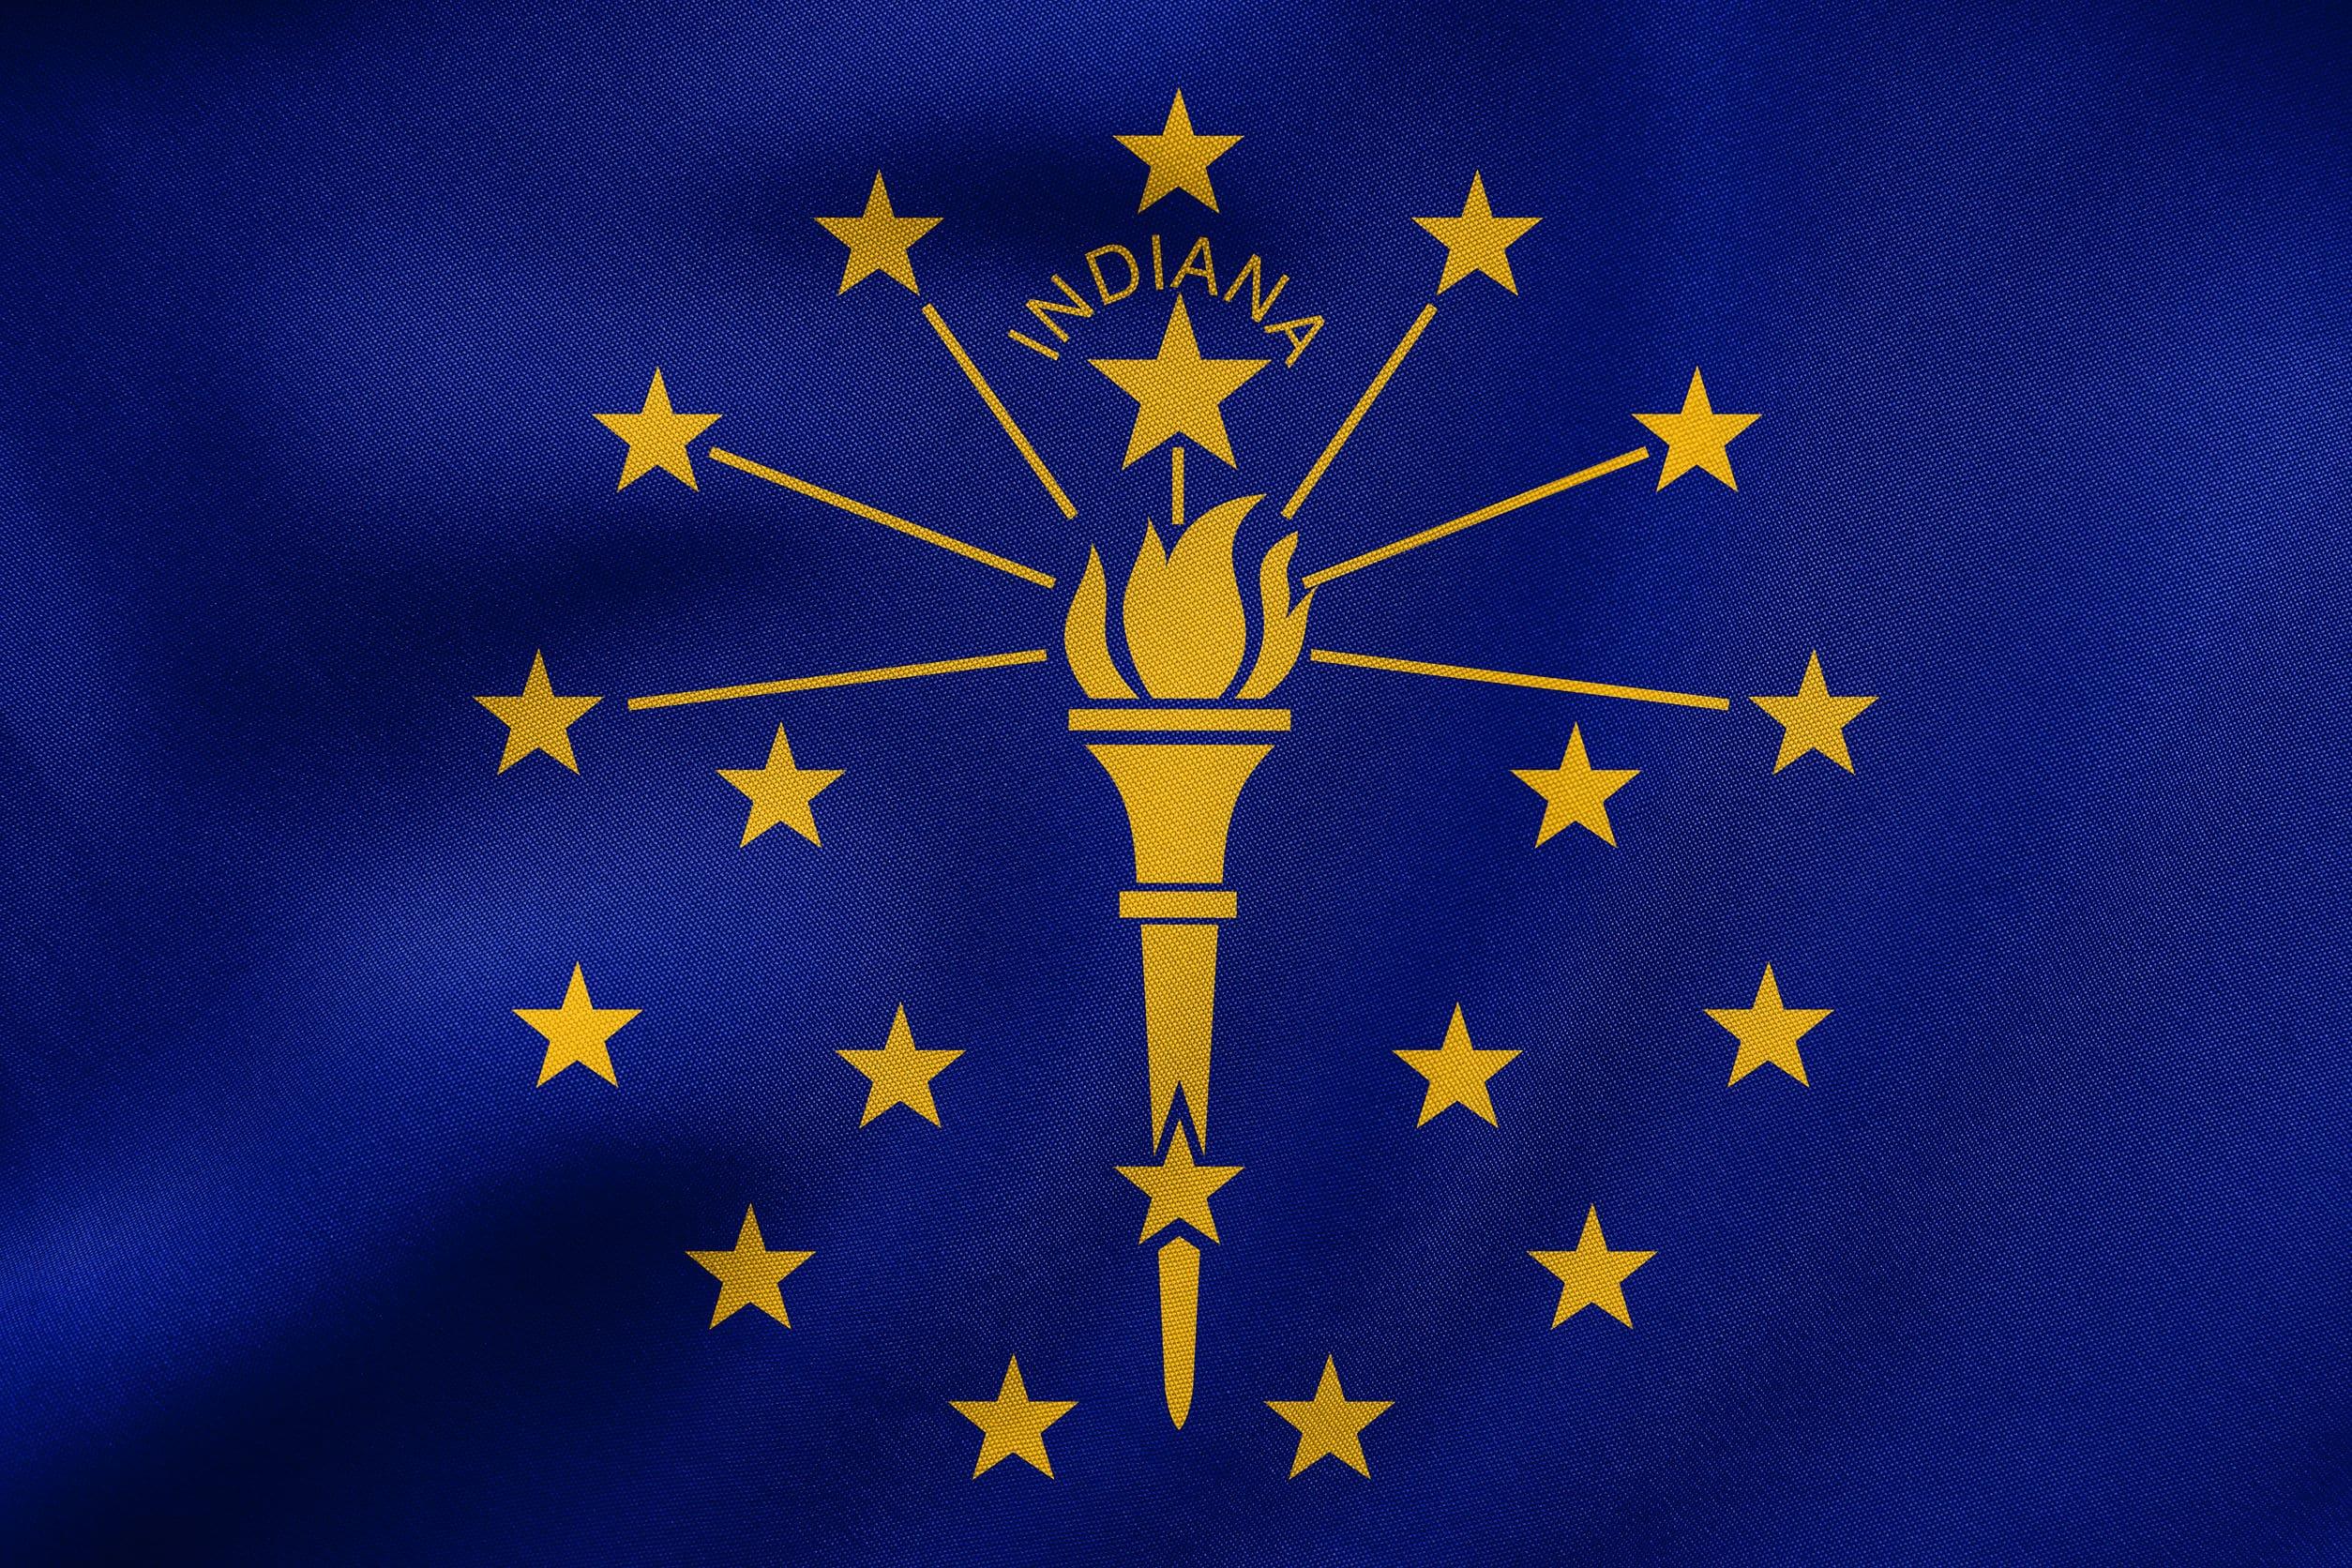 Flag of Indiana waving